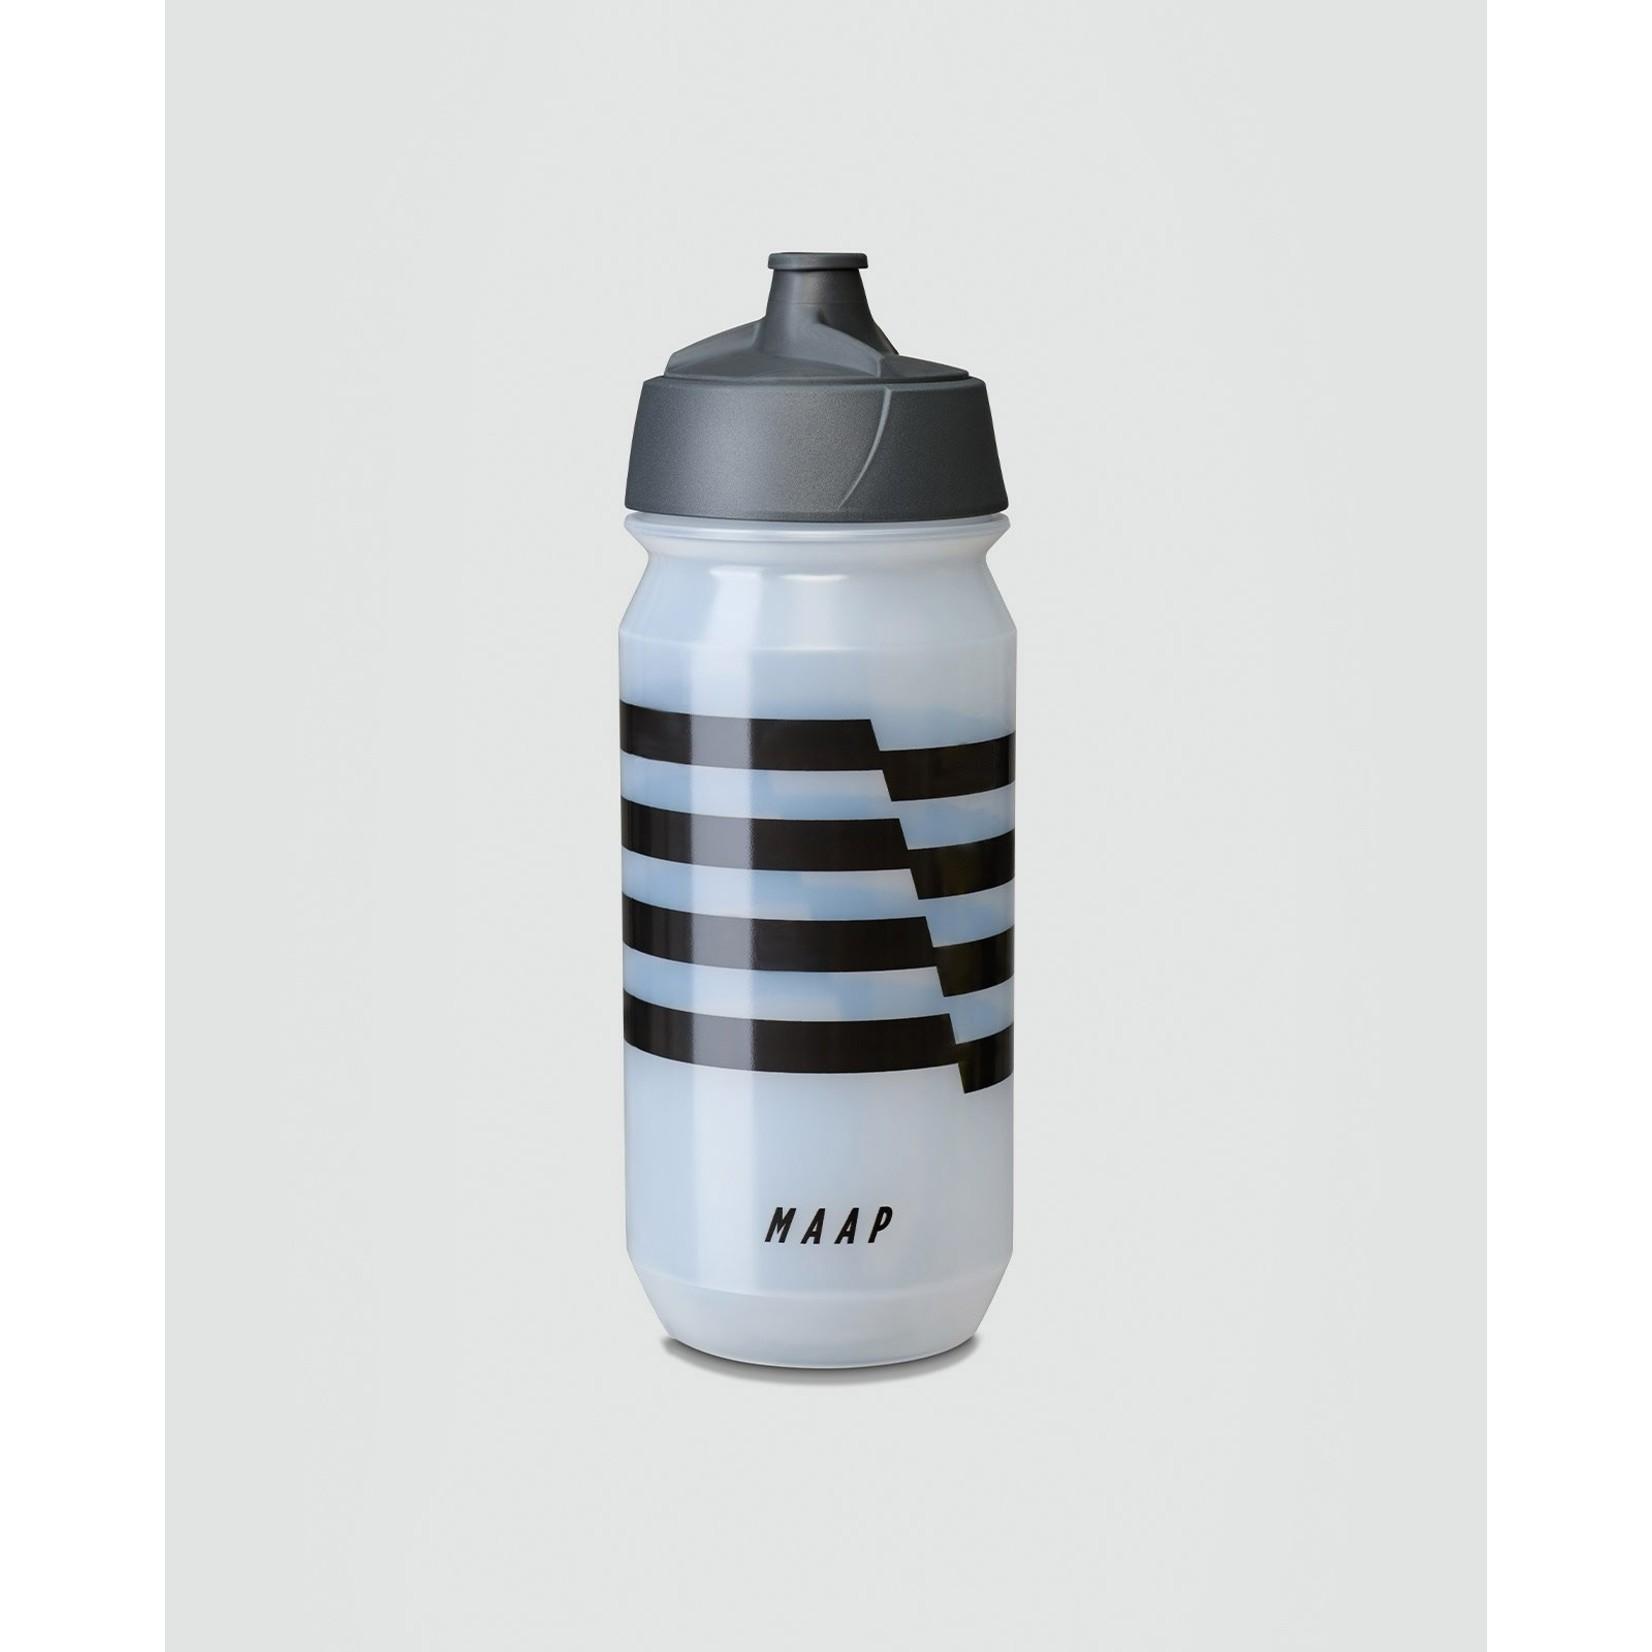 MAAP Emblem Bottle - Transparent/Black